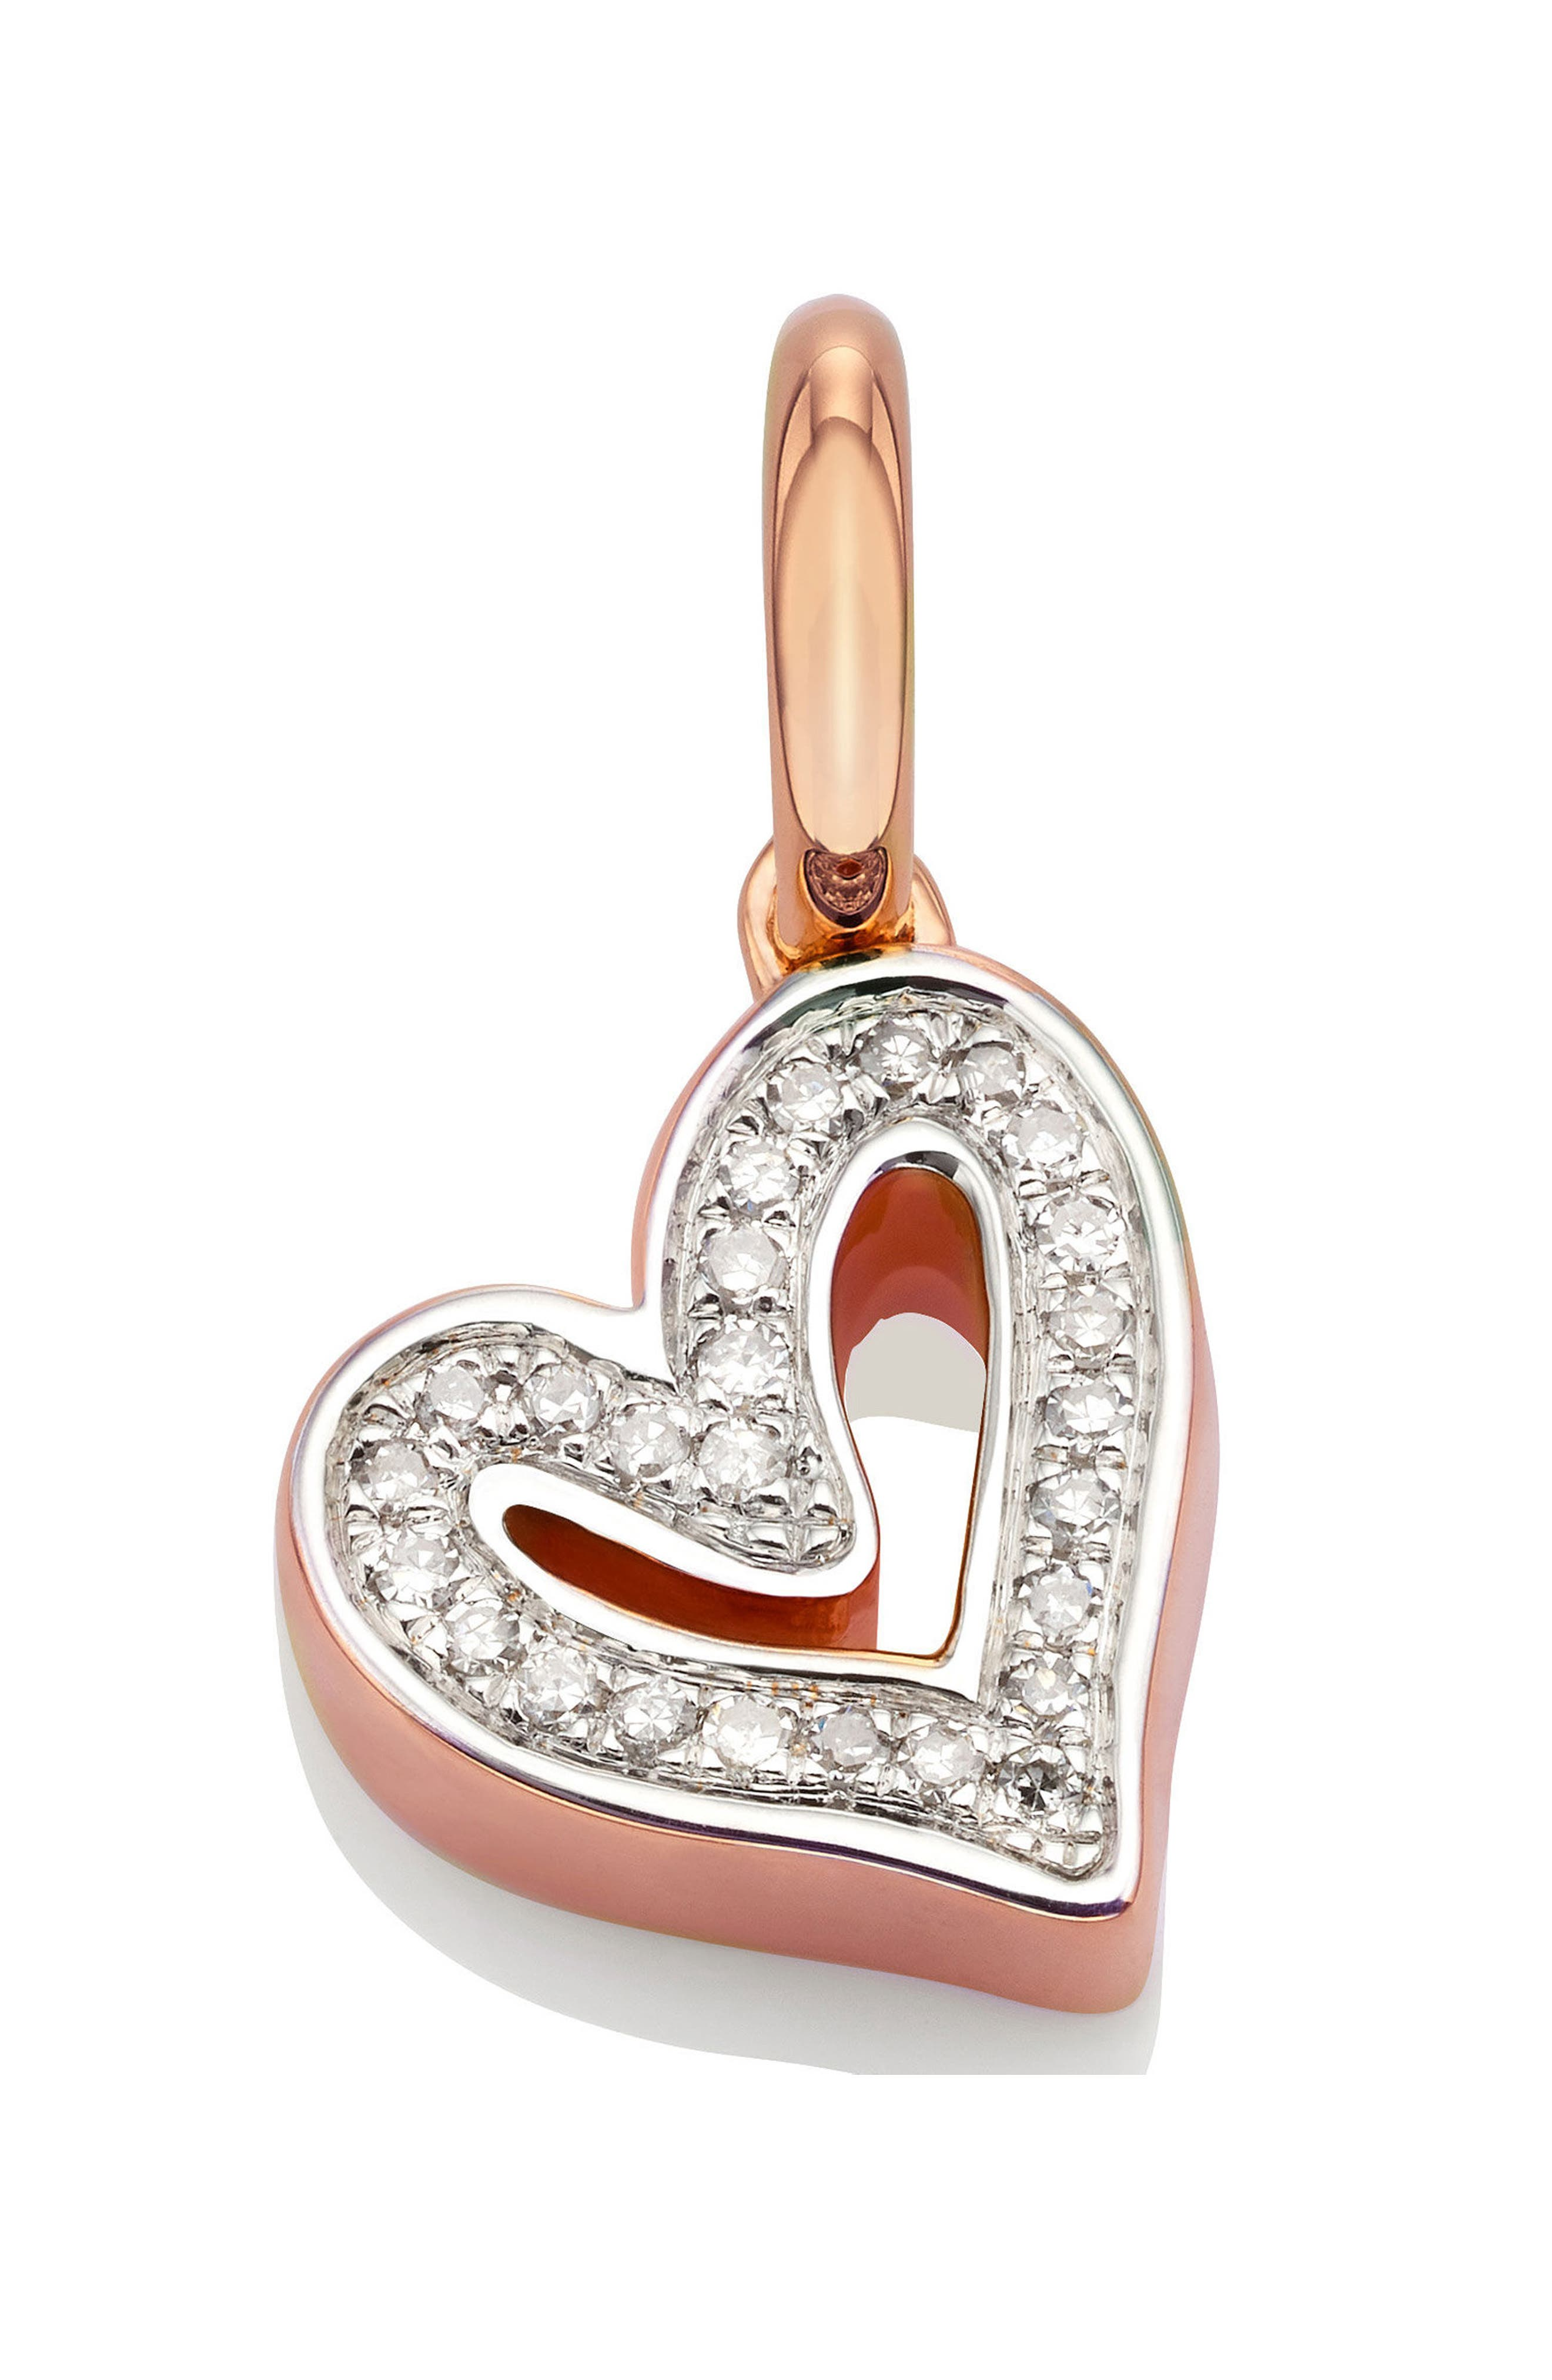 Alphabet Heart Diamond Pendant Charm,                             Main thumbnail 1, color,                             ROSE GOLD